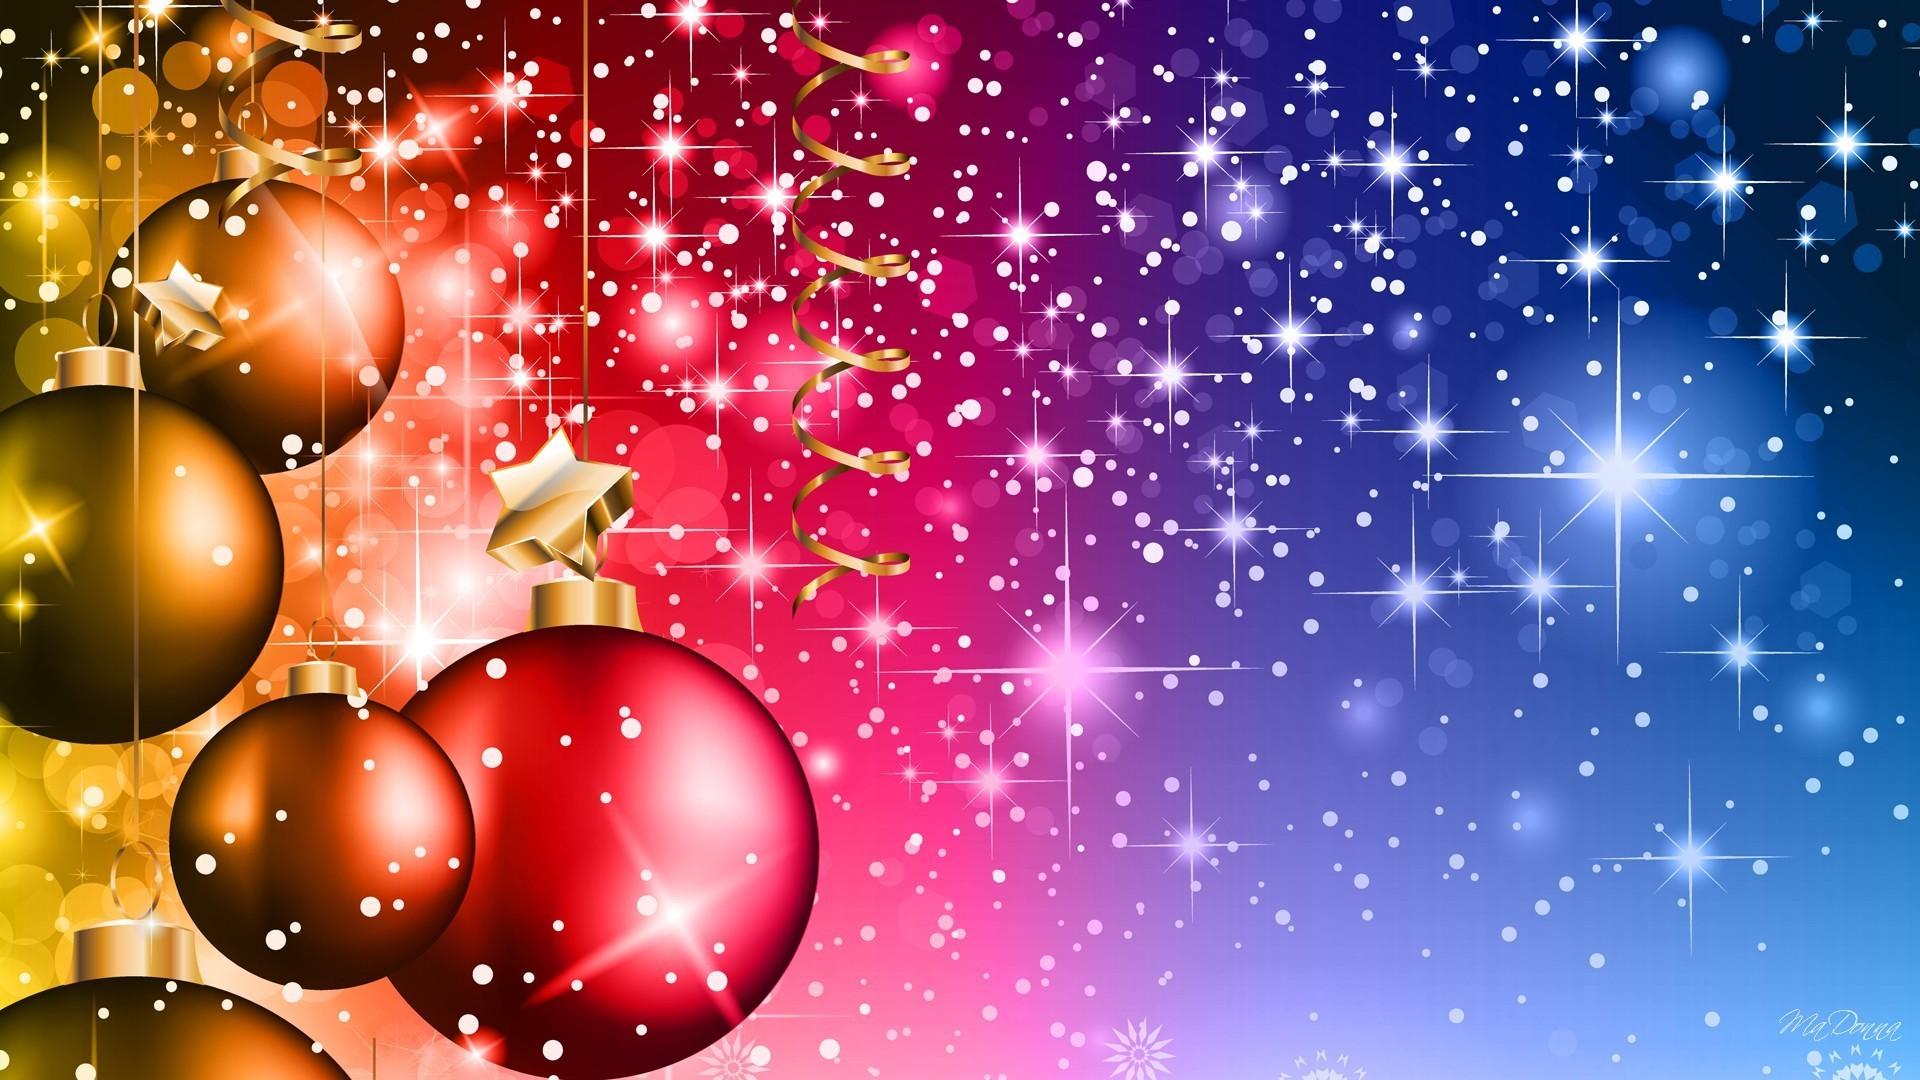 Holiday Christmas Hd Wallpaper: Christmas Themed Backgrounds ·① WallpaperTag